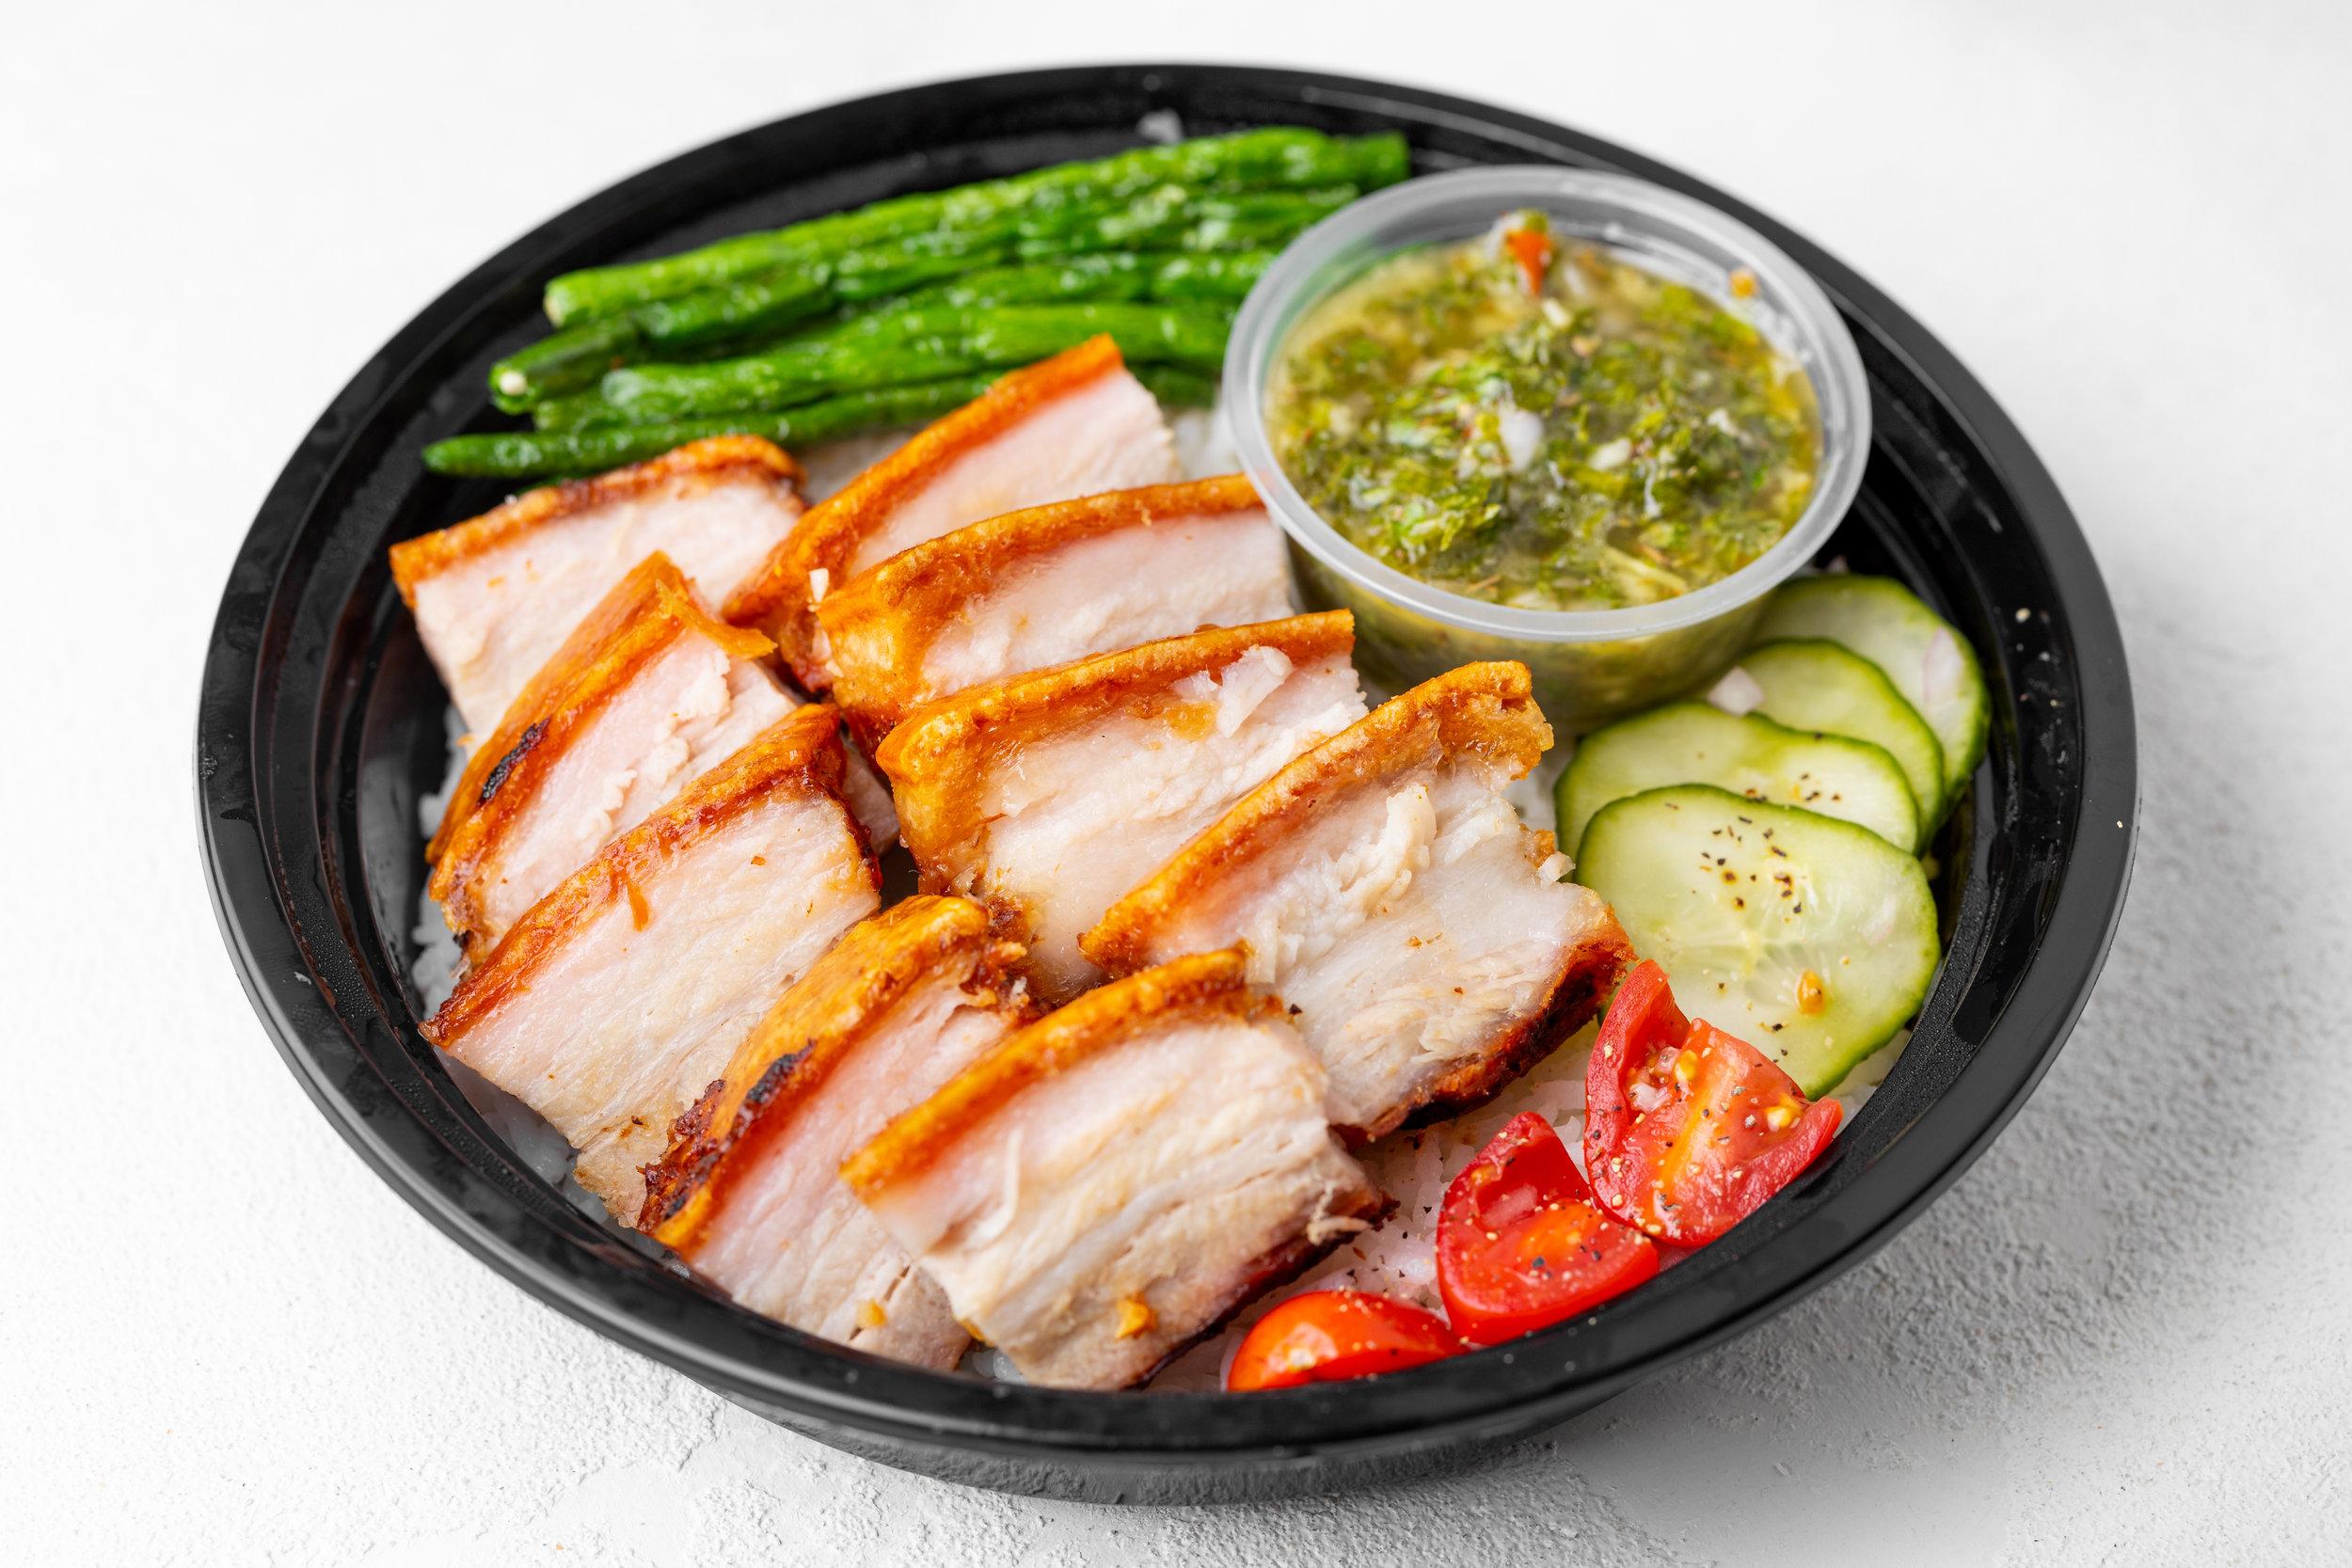 Lechon Kawali - Oven-crisped pork, pickled cucumber.Your choice of: homemade apple sarsa or market citrus chimichurri